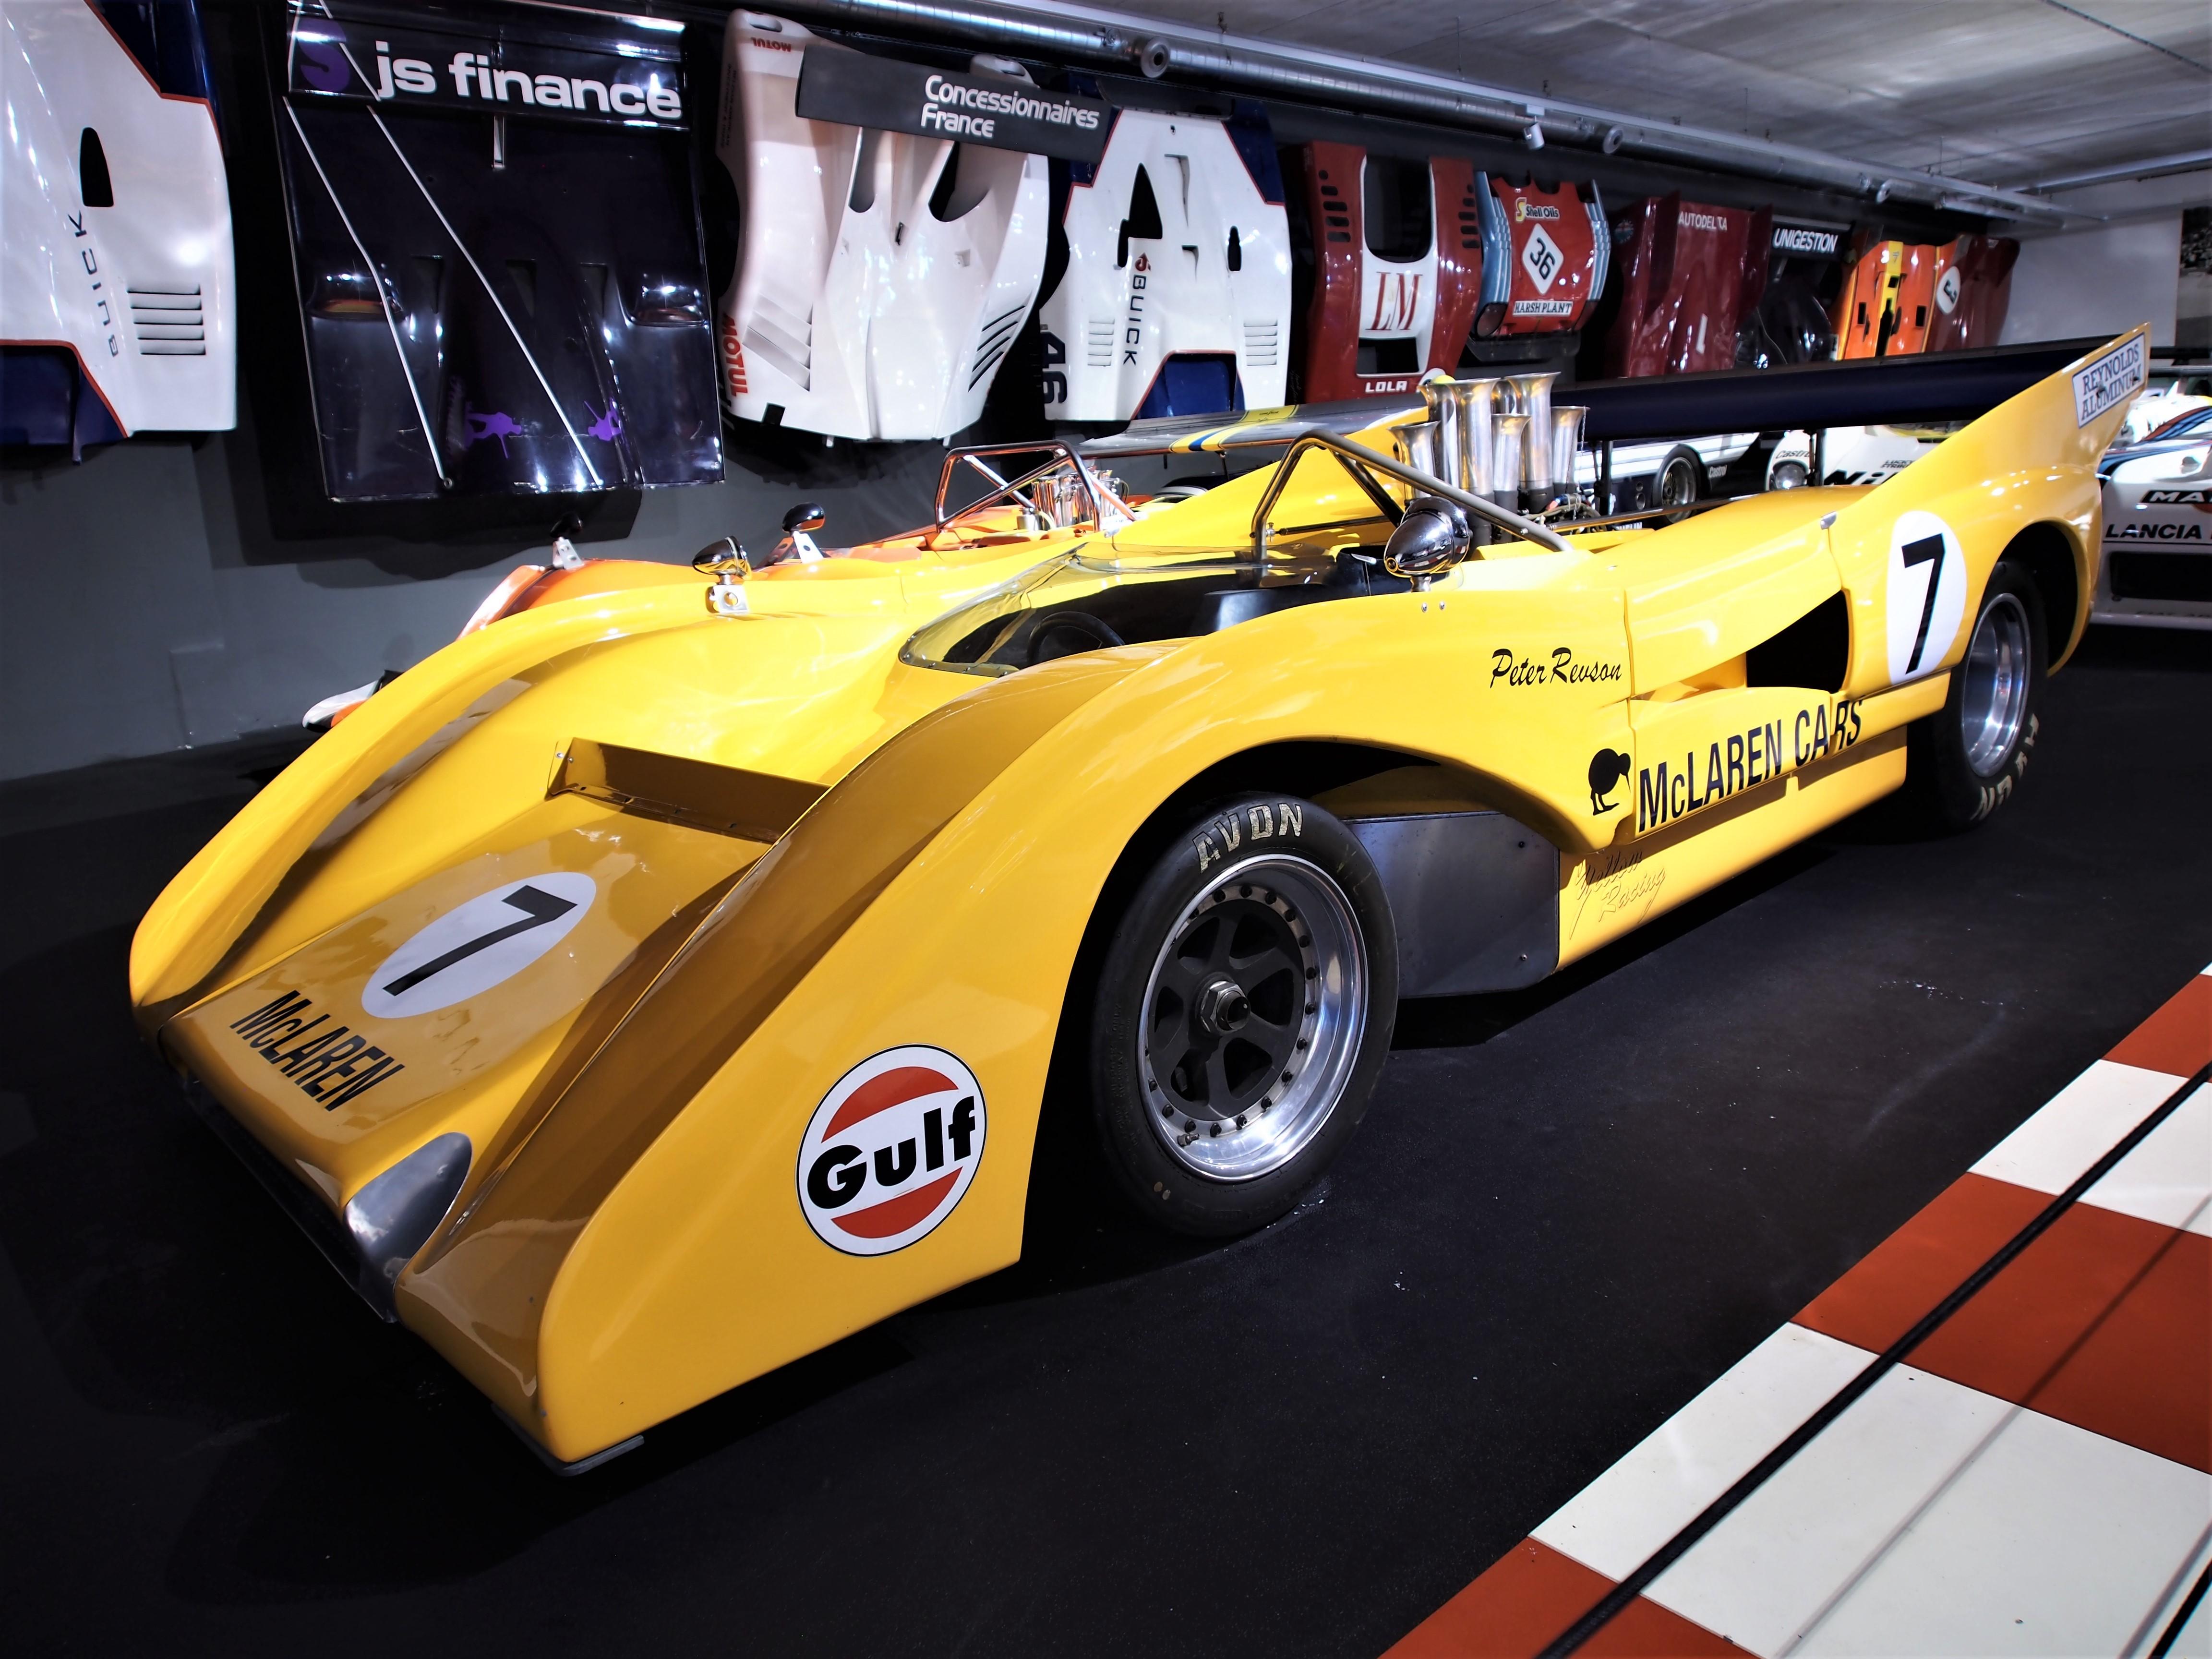 File:1971 McLaren M8F 8 1 litre 8 cylinder 750hp photo 2 JPG